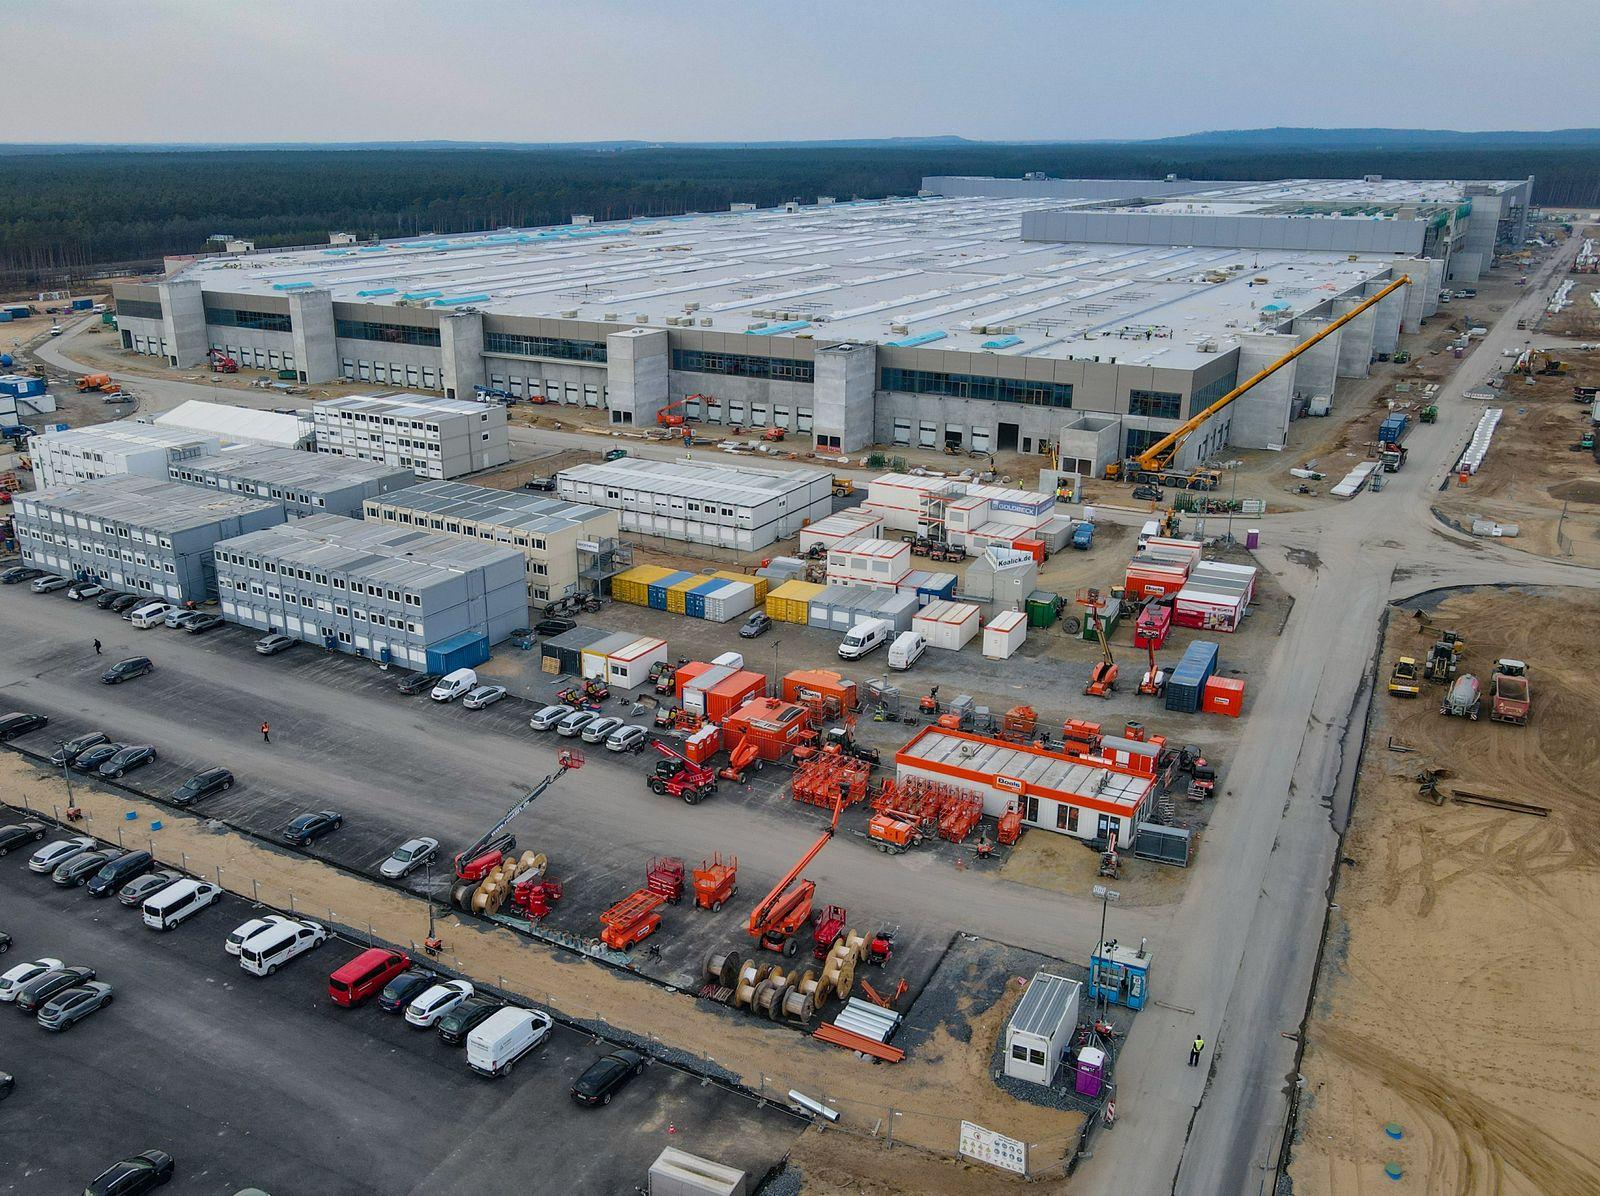 Baugelände der Tesla Gigafactory in Grünheide